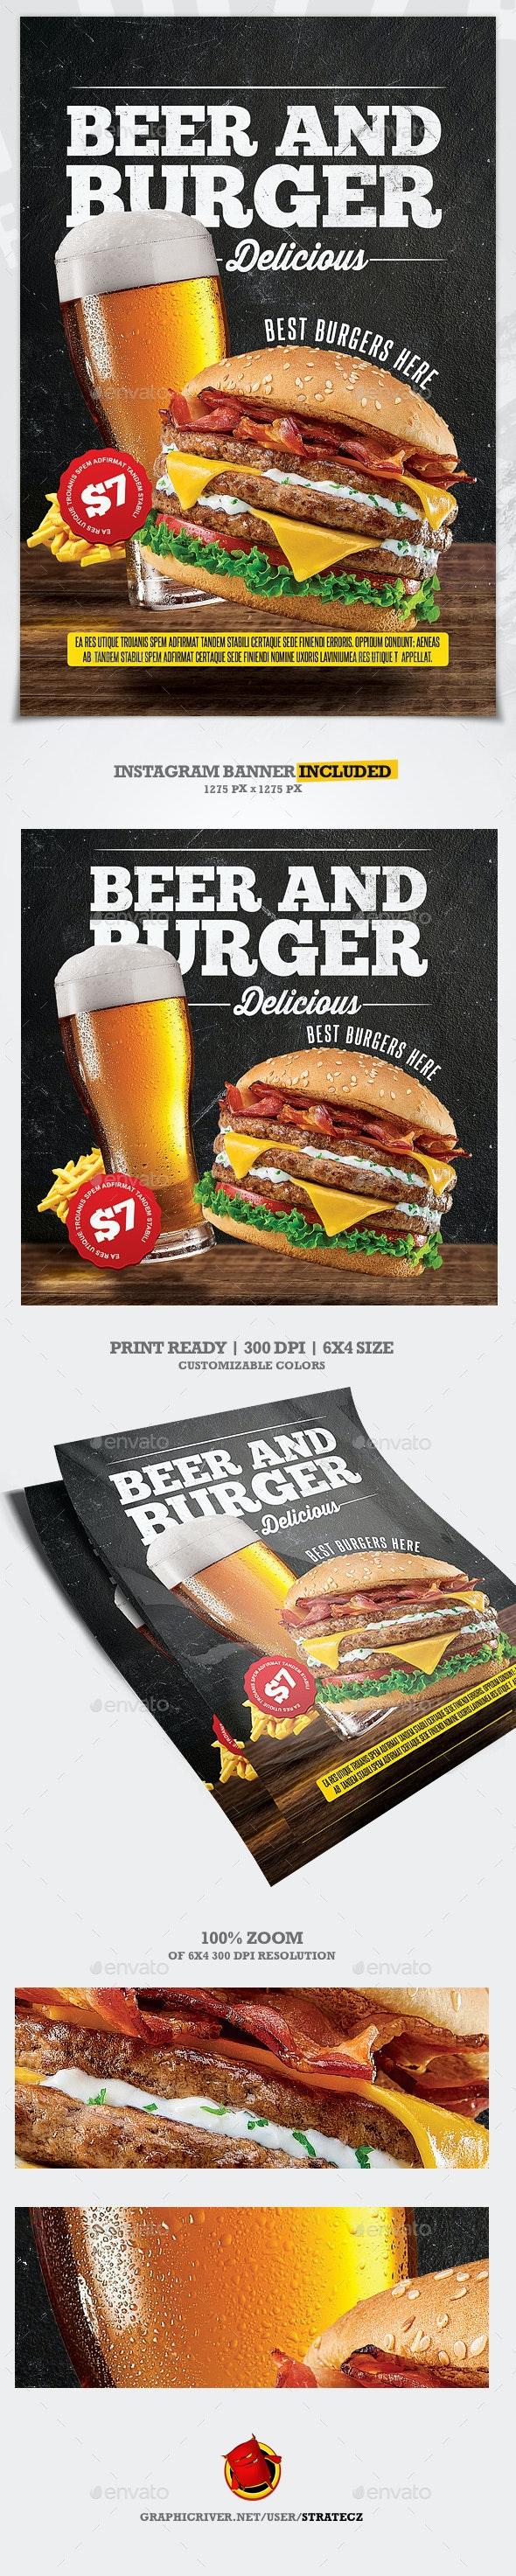 Burger Food Flyer / Burger House - Print Templates